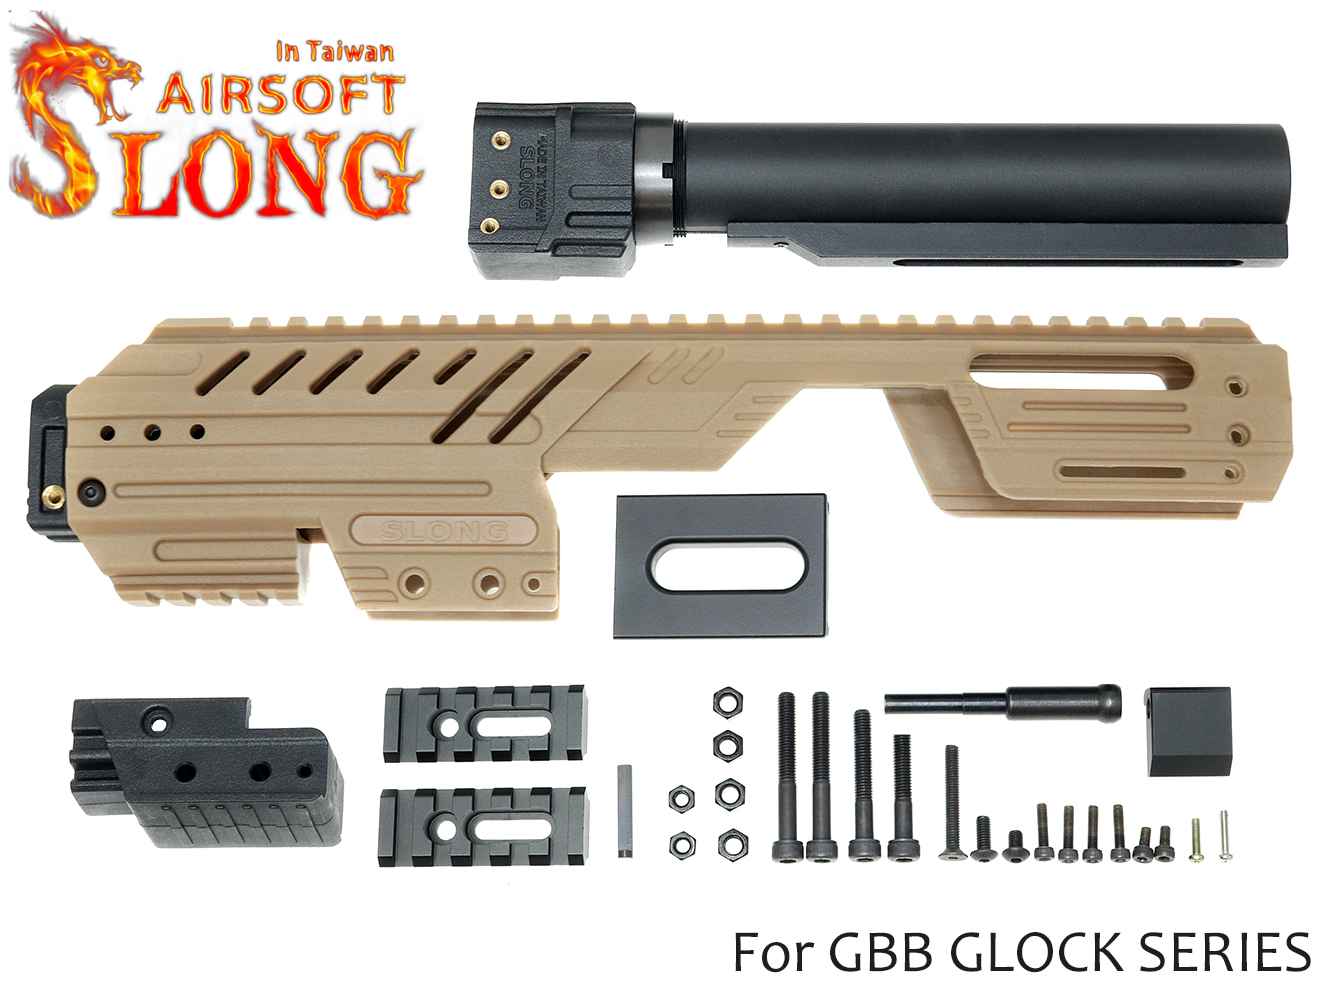 SLONG AIRSOFT MPG-KRISS コンバージョンキット for G17/G18C/G22/G34◆TAN グロックシリーズを瞬時にPDW化 SMG化 取り回し◎ CQCに